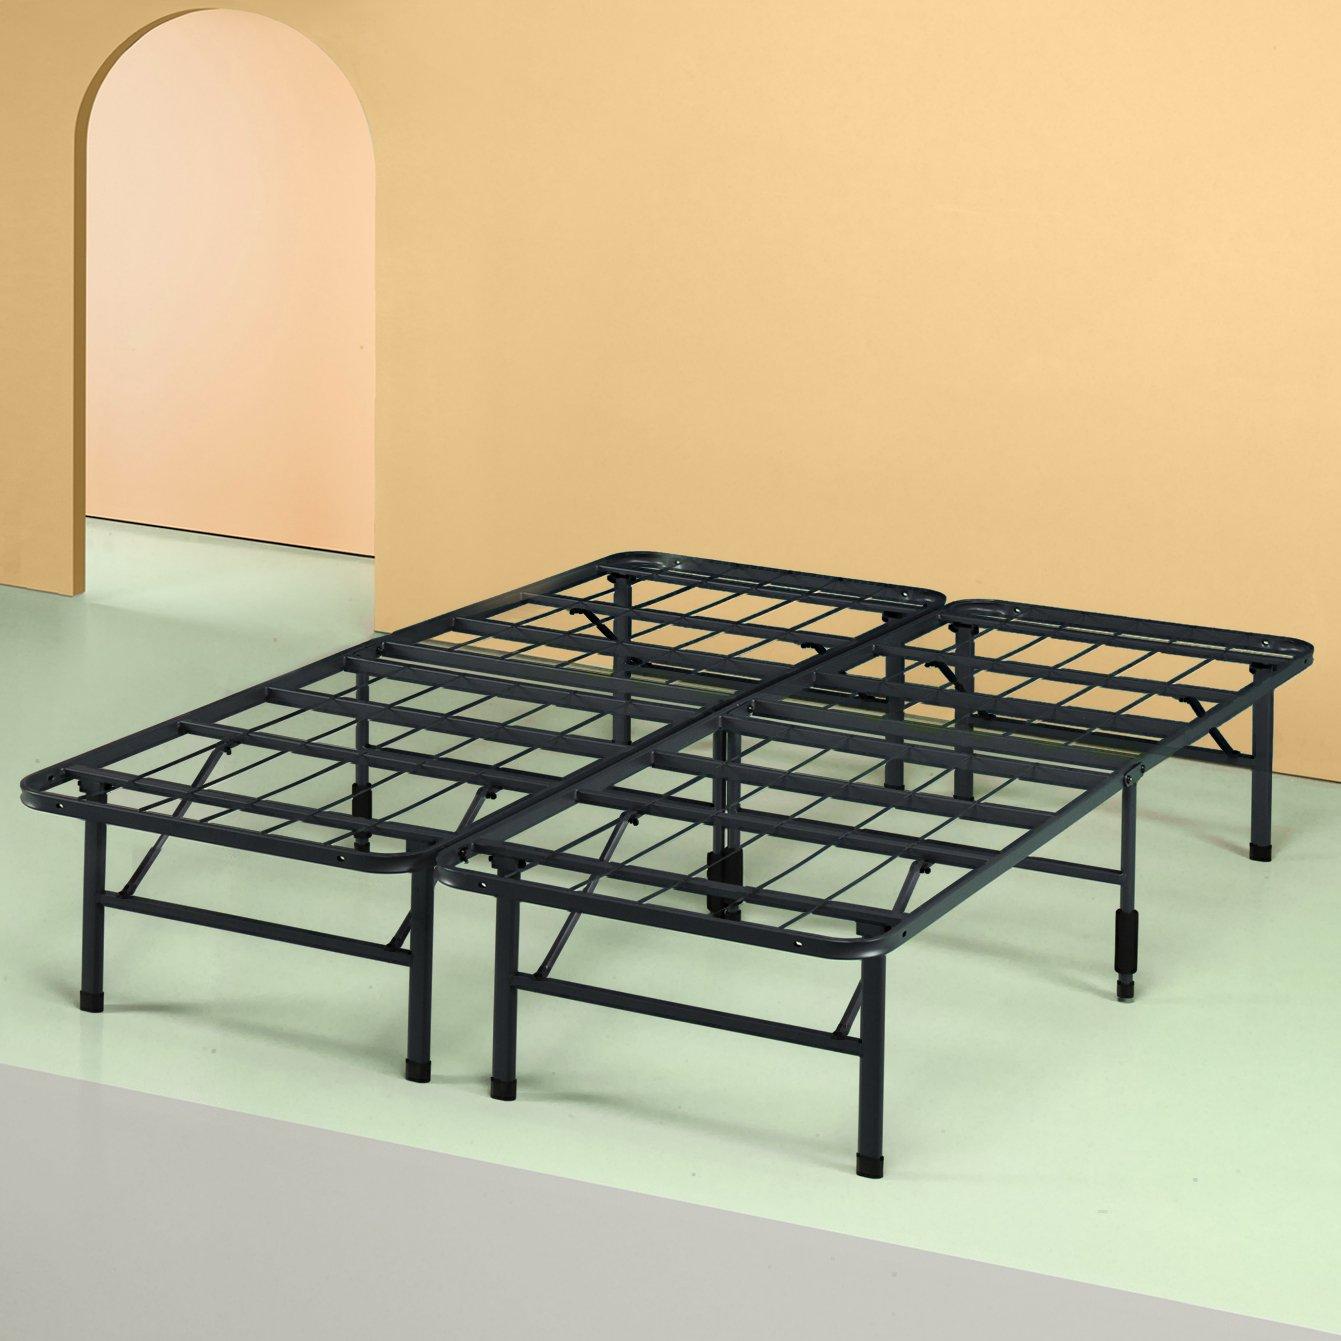 Zinus Shawn 14 Inch SmartBase Mattress Foundation / Platform Bed Frame / Box Spring Replacement / Quiet Noise-Free / Maximum Under-bed Storage, Queen by Zinus